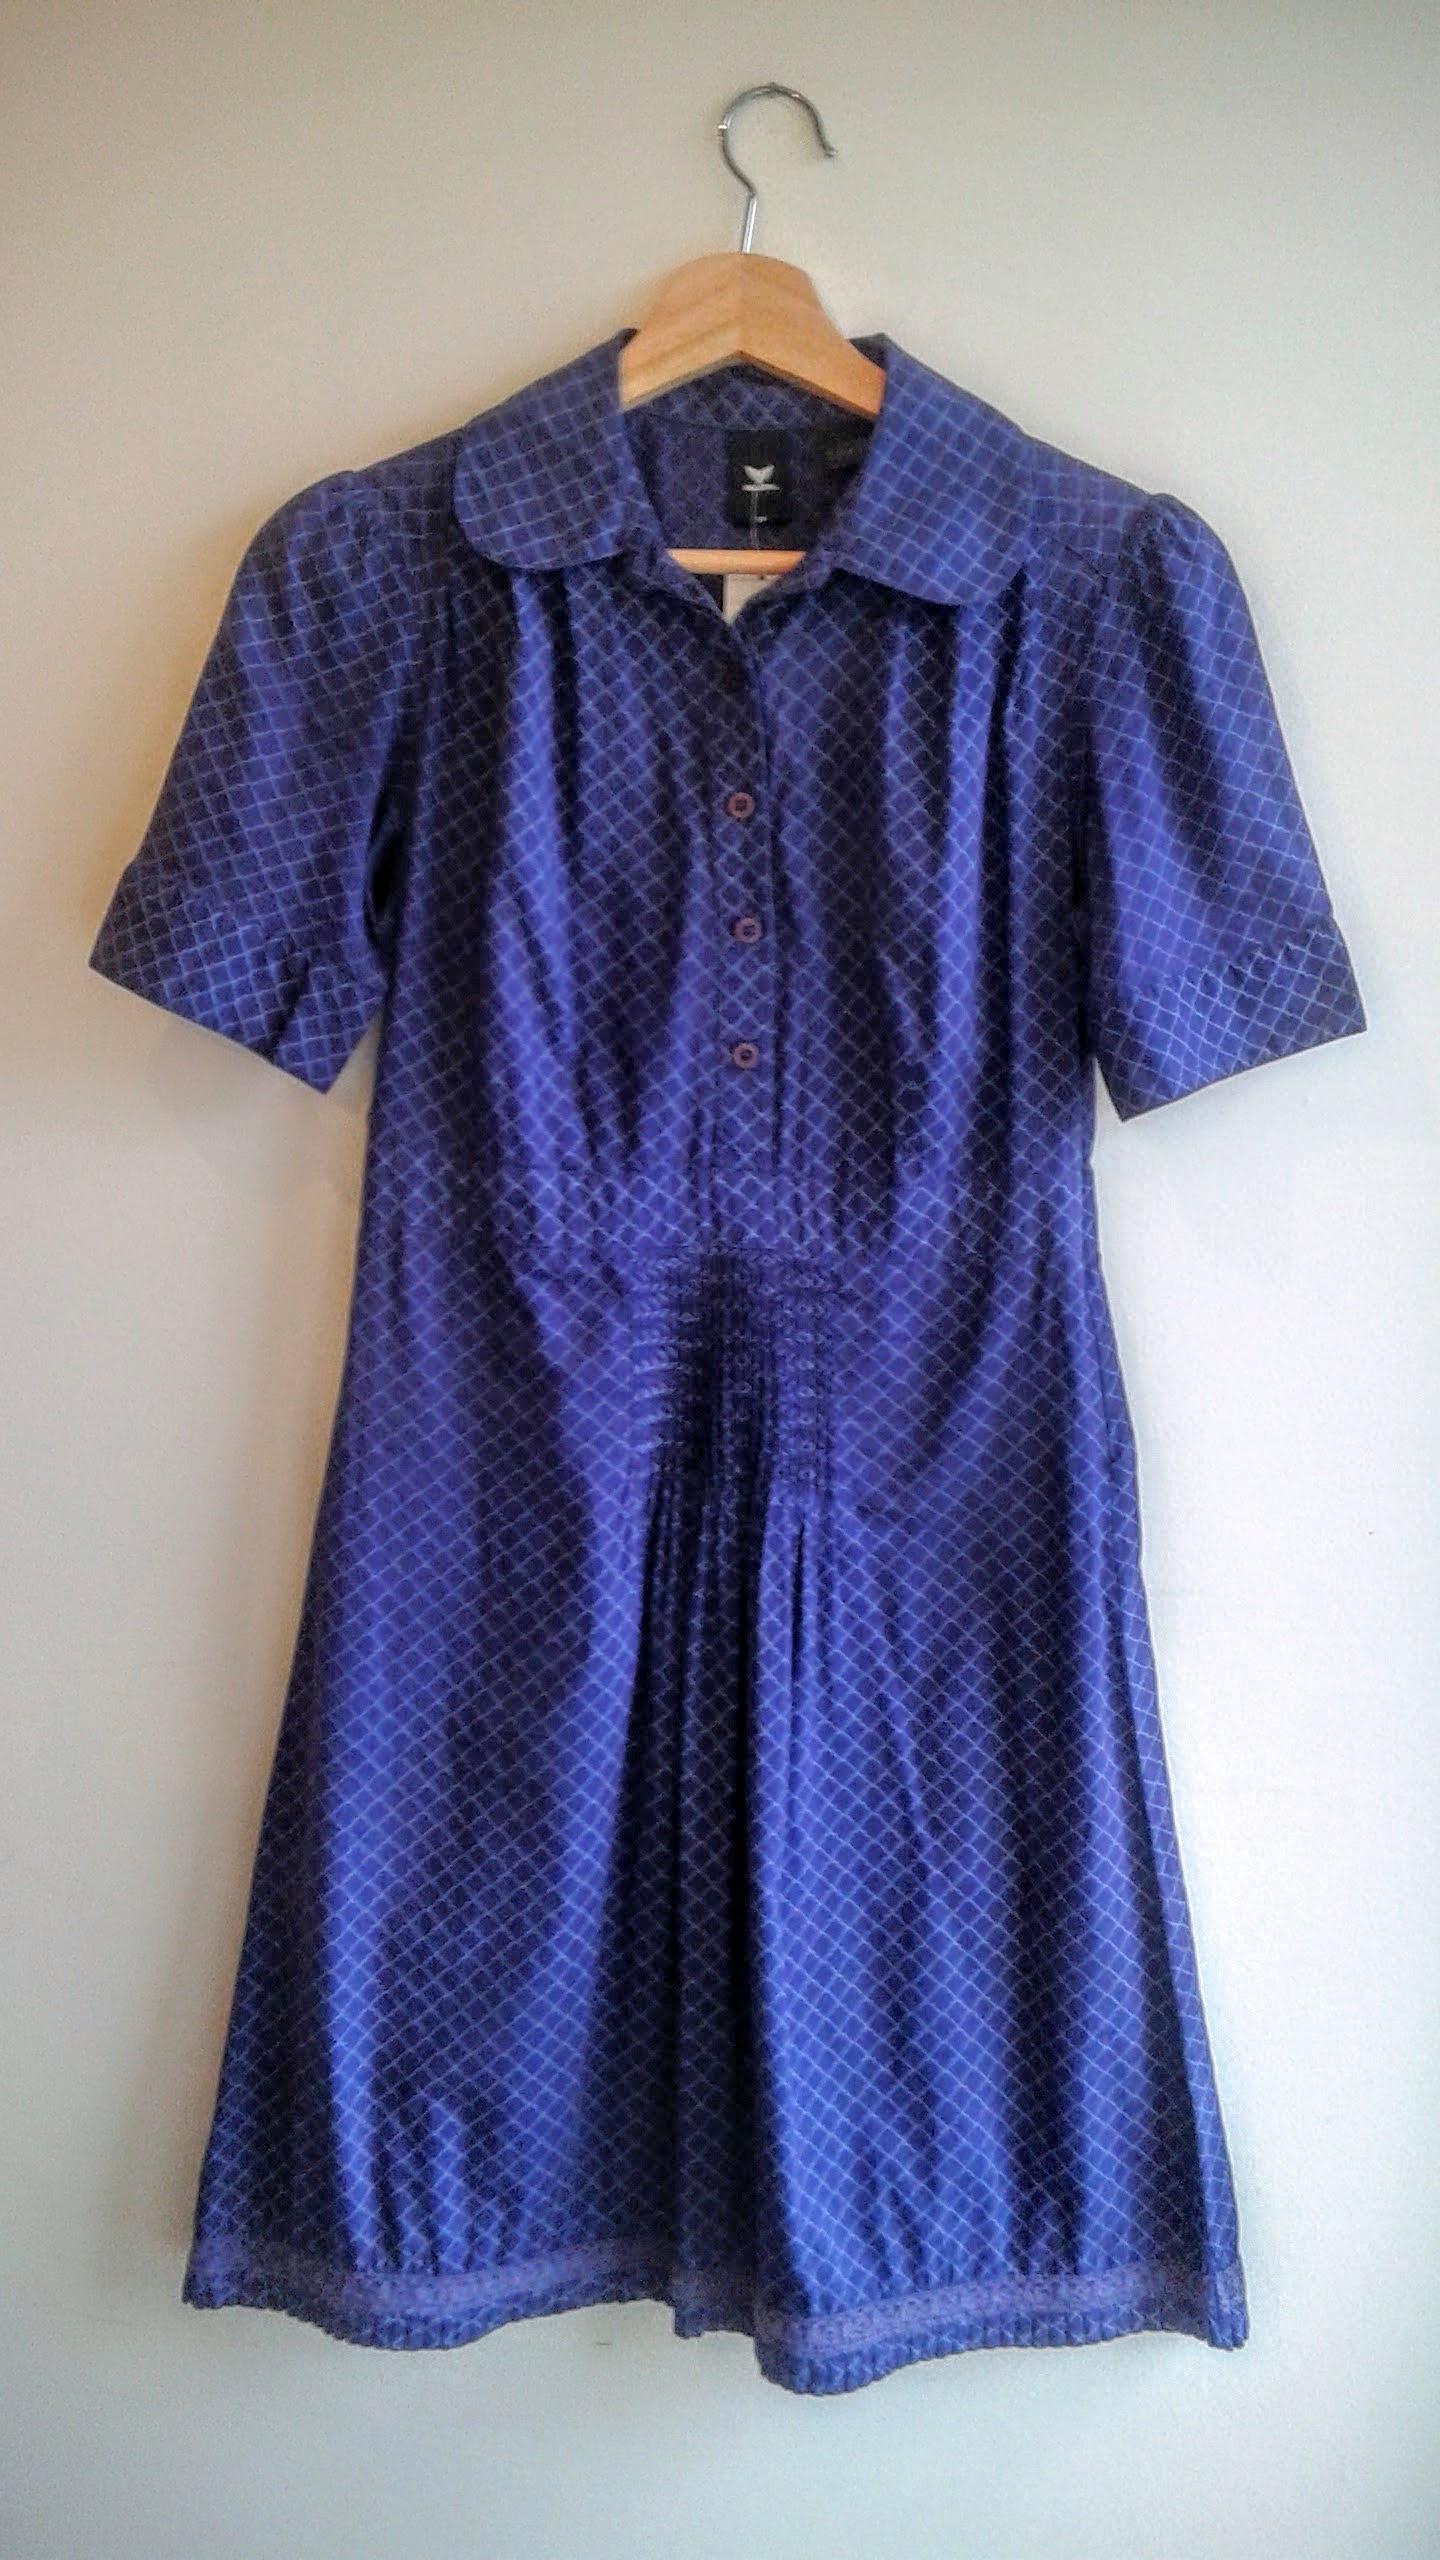 Industry dress; Size S, $26